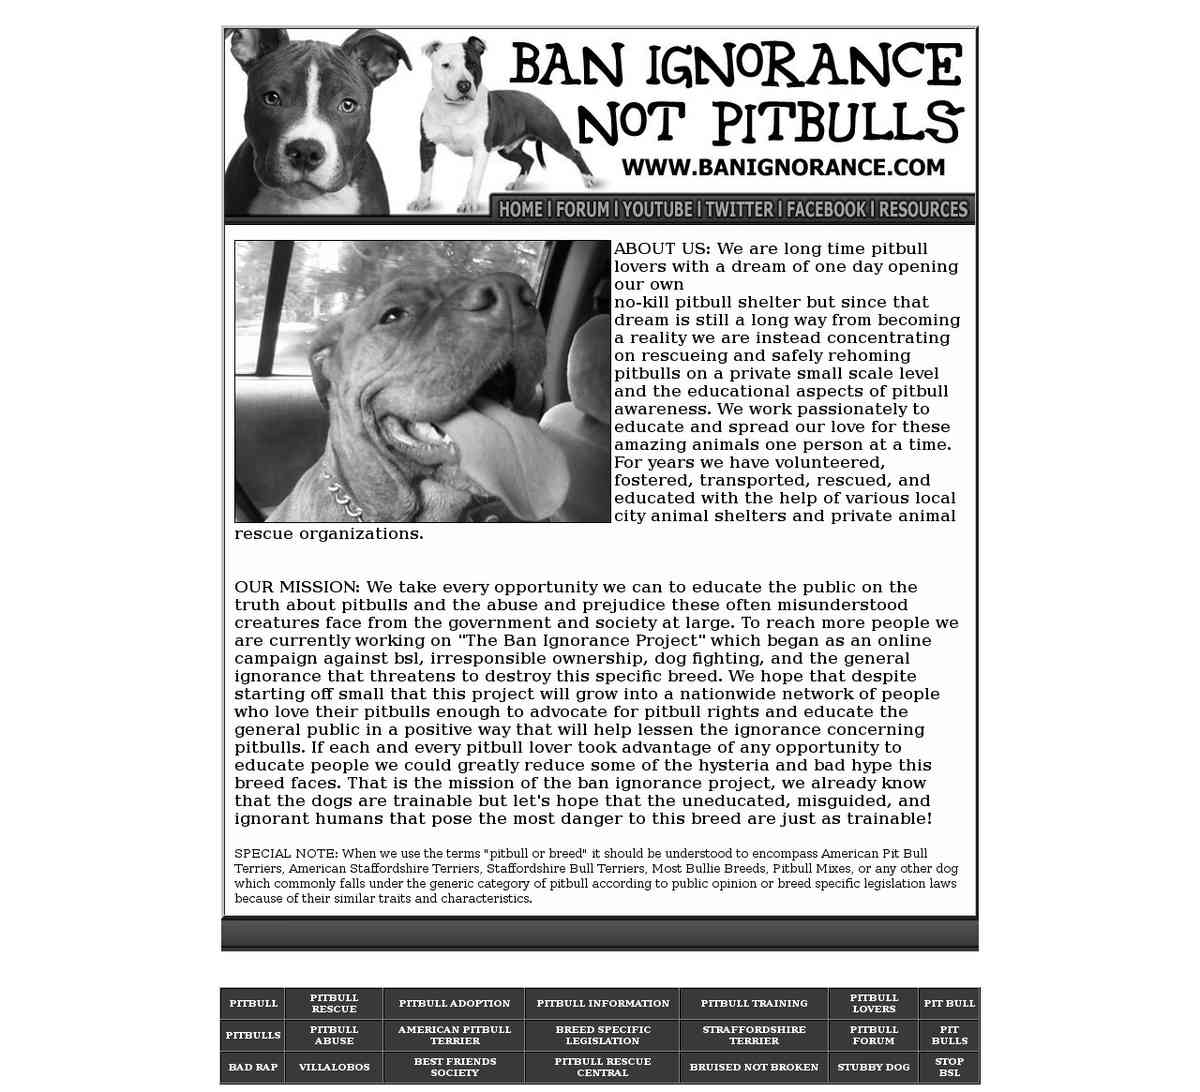 Ban Ignorance Not Pitbulls